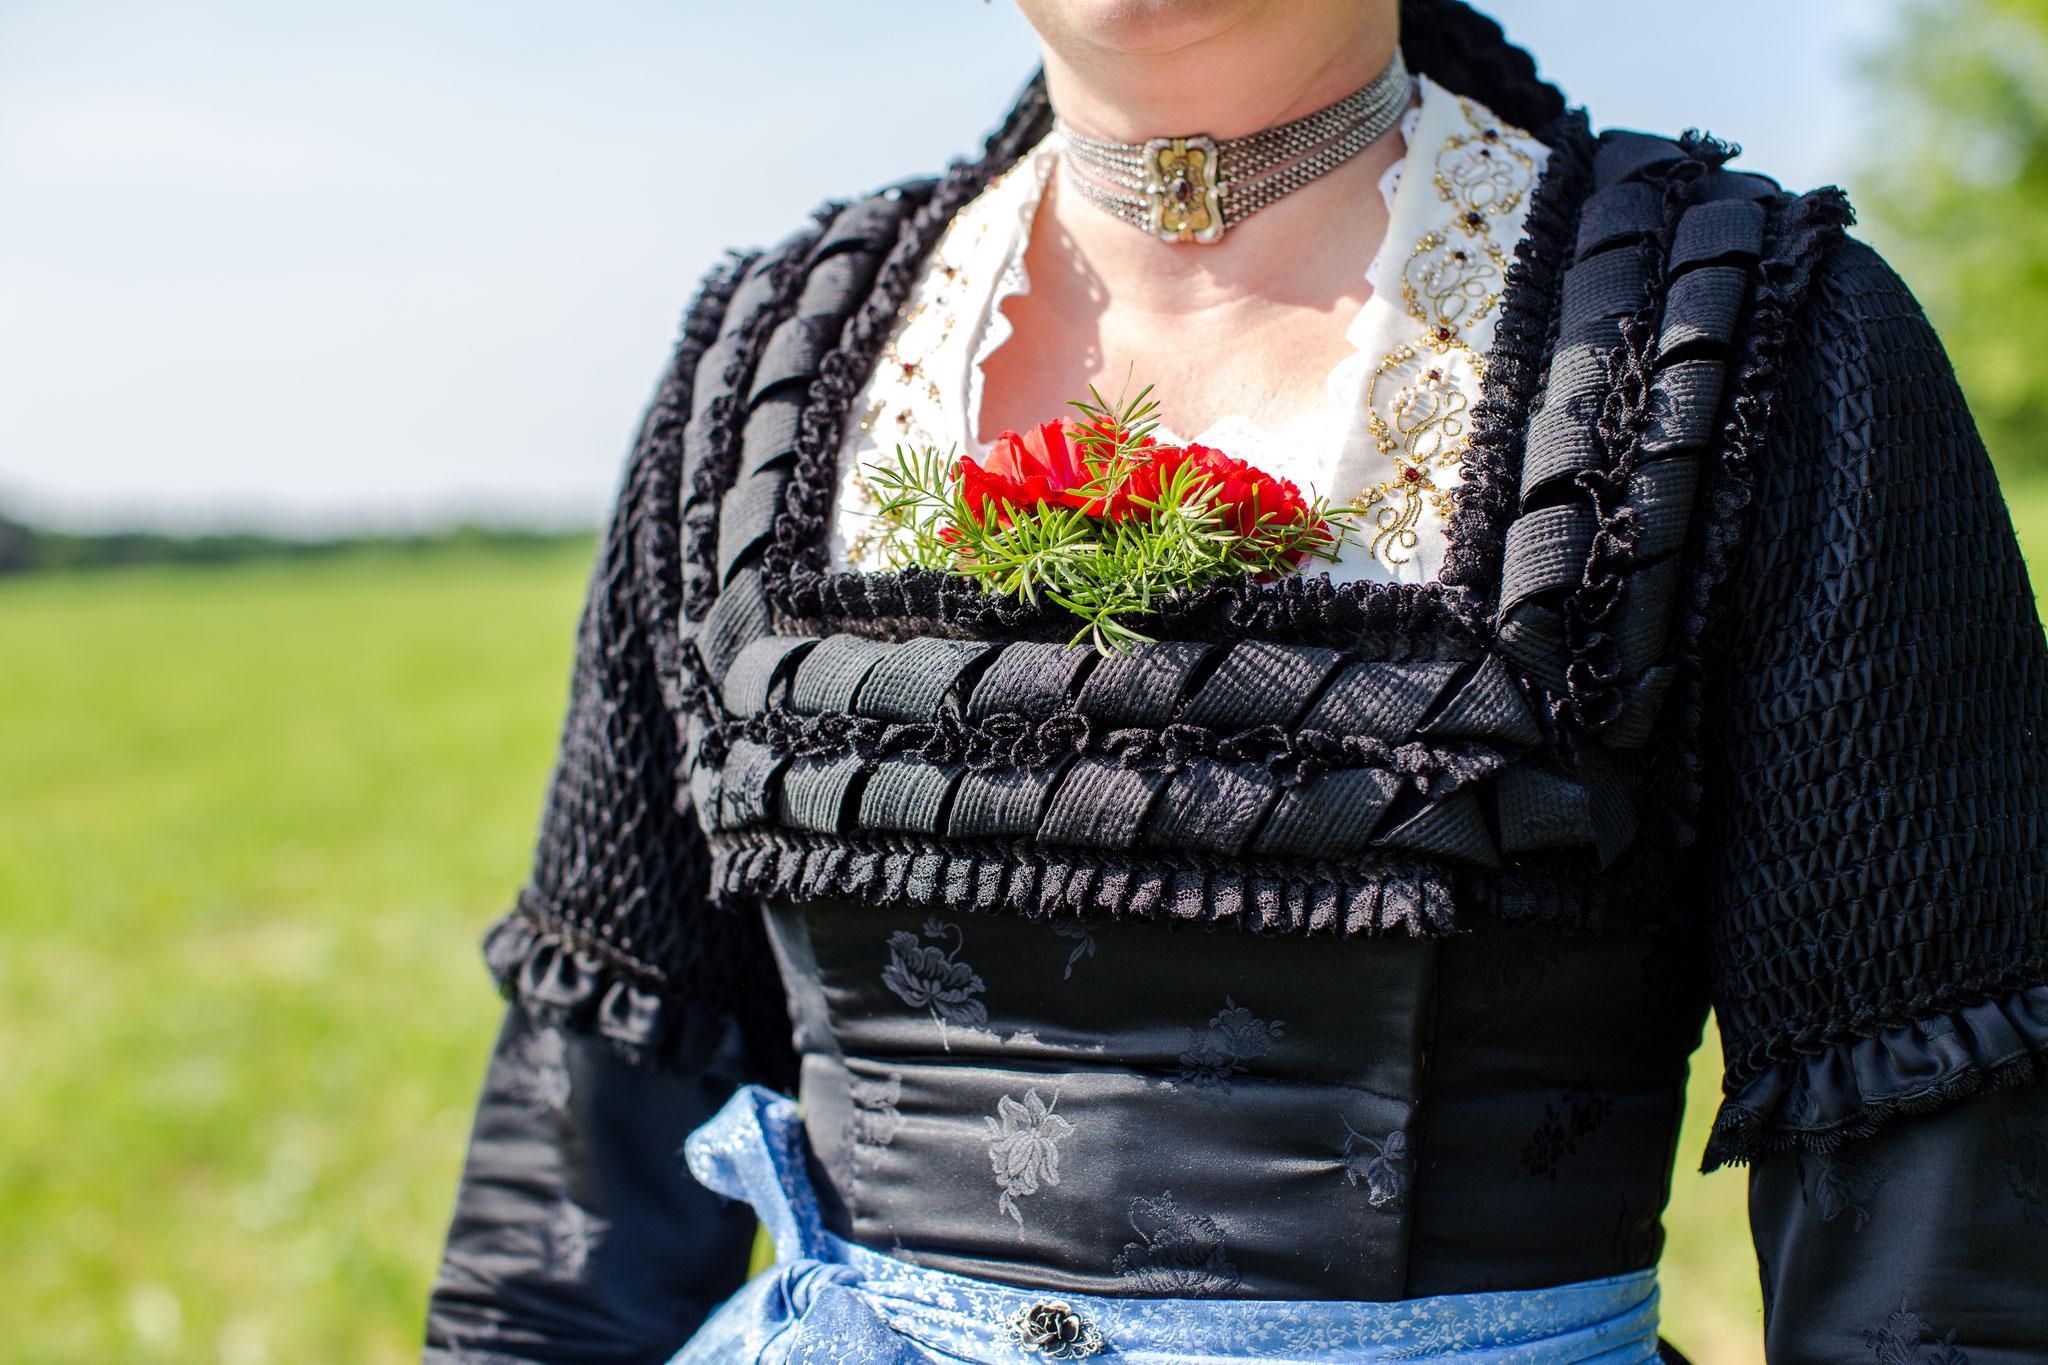 Kasettlfrau D'Lindntaler Lauterbach - Fotoshooting zum Gaufest 2018 in Lauterbach